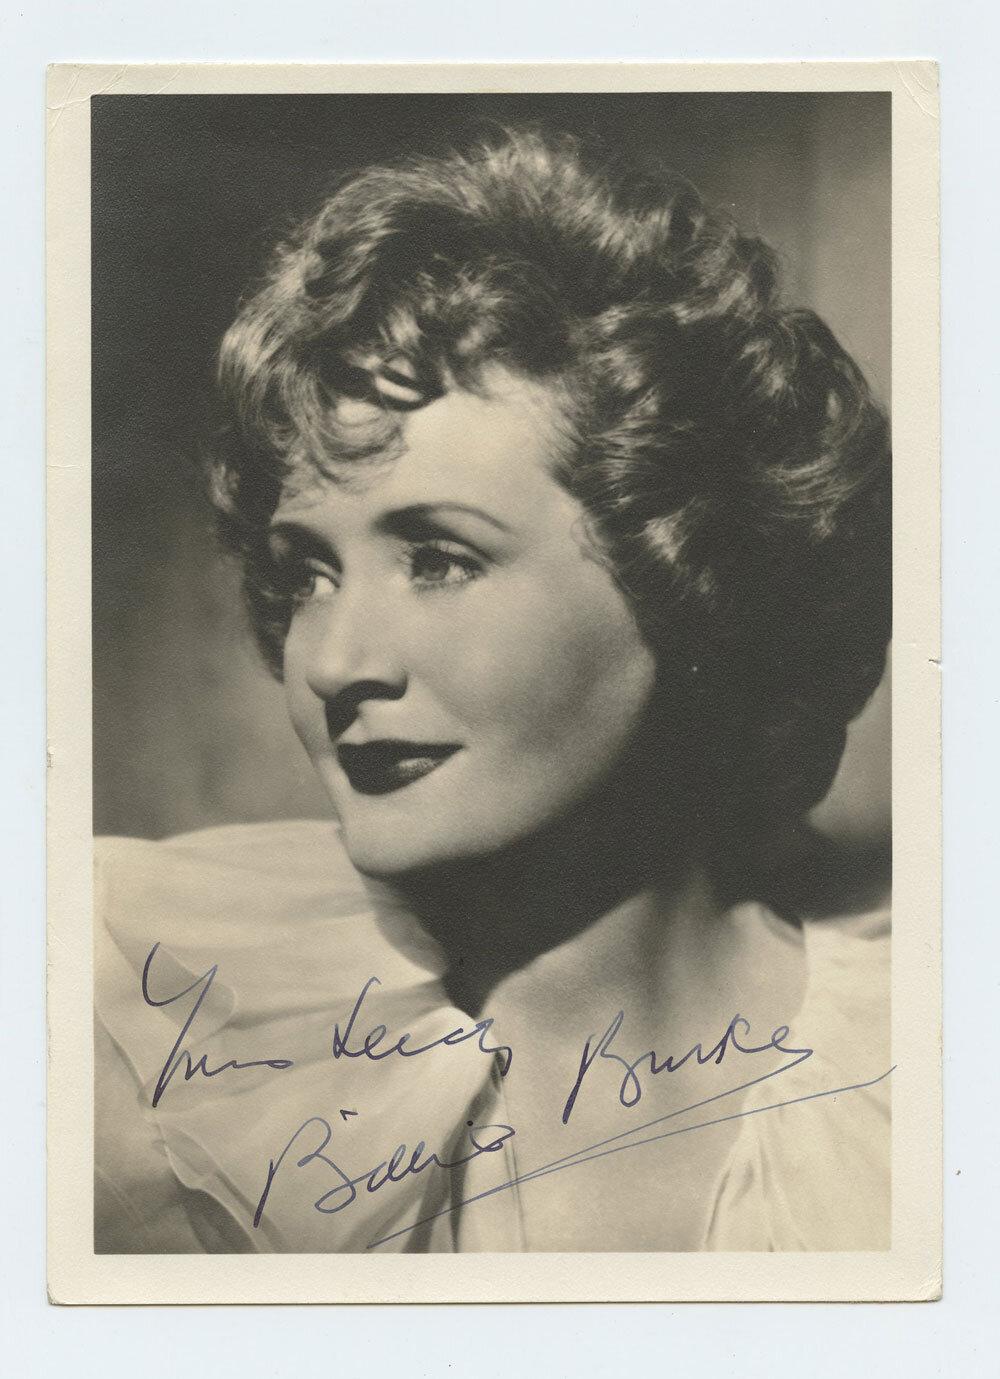 Billie Burke Photograph 1940s Autographed Inscribed Original Vintage